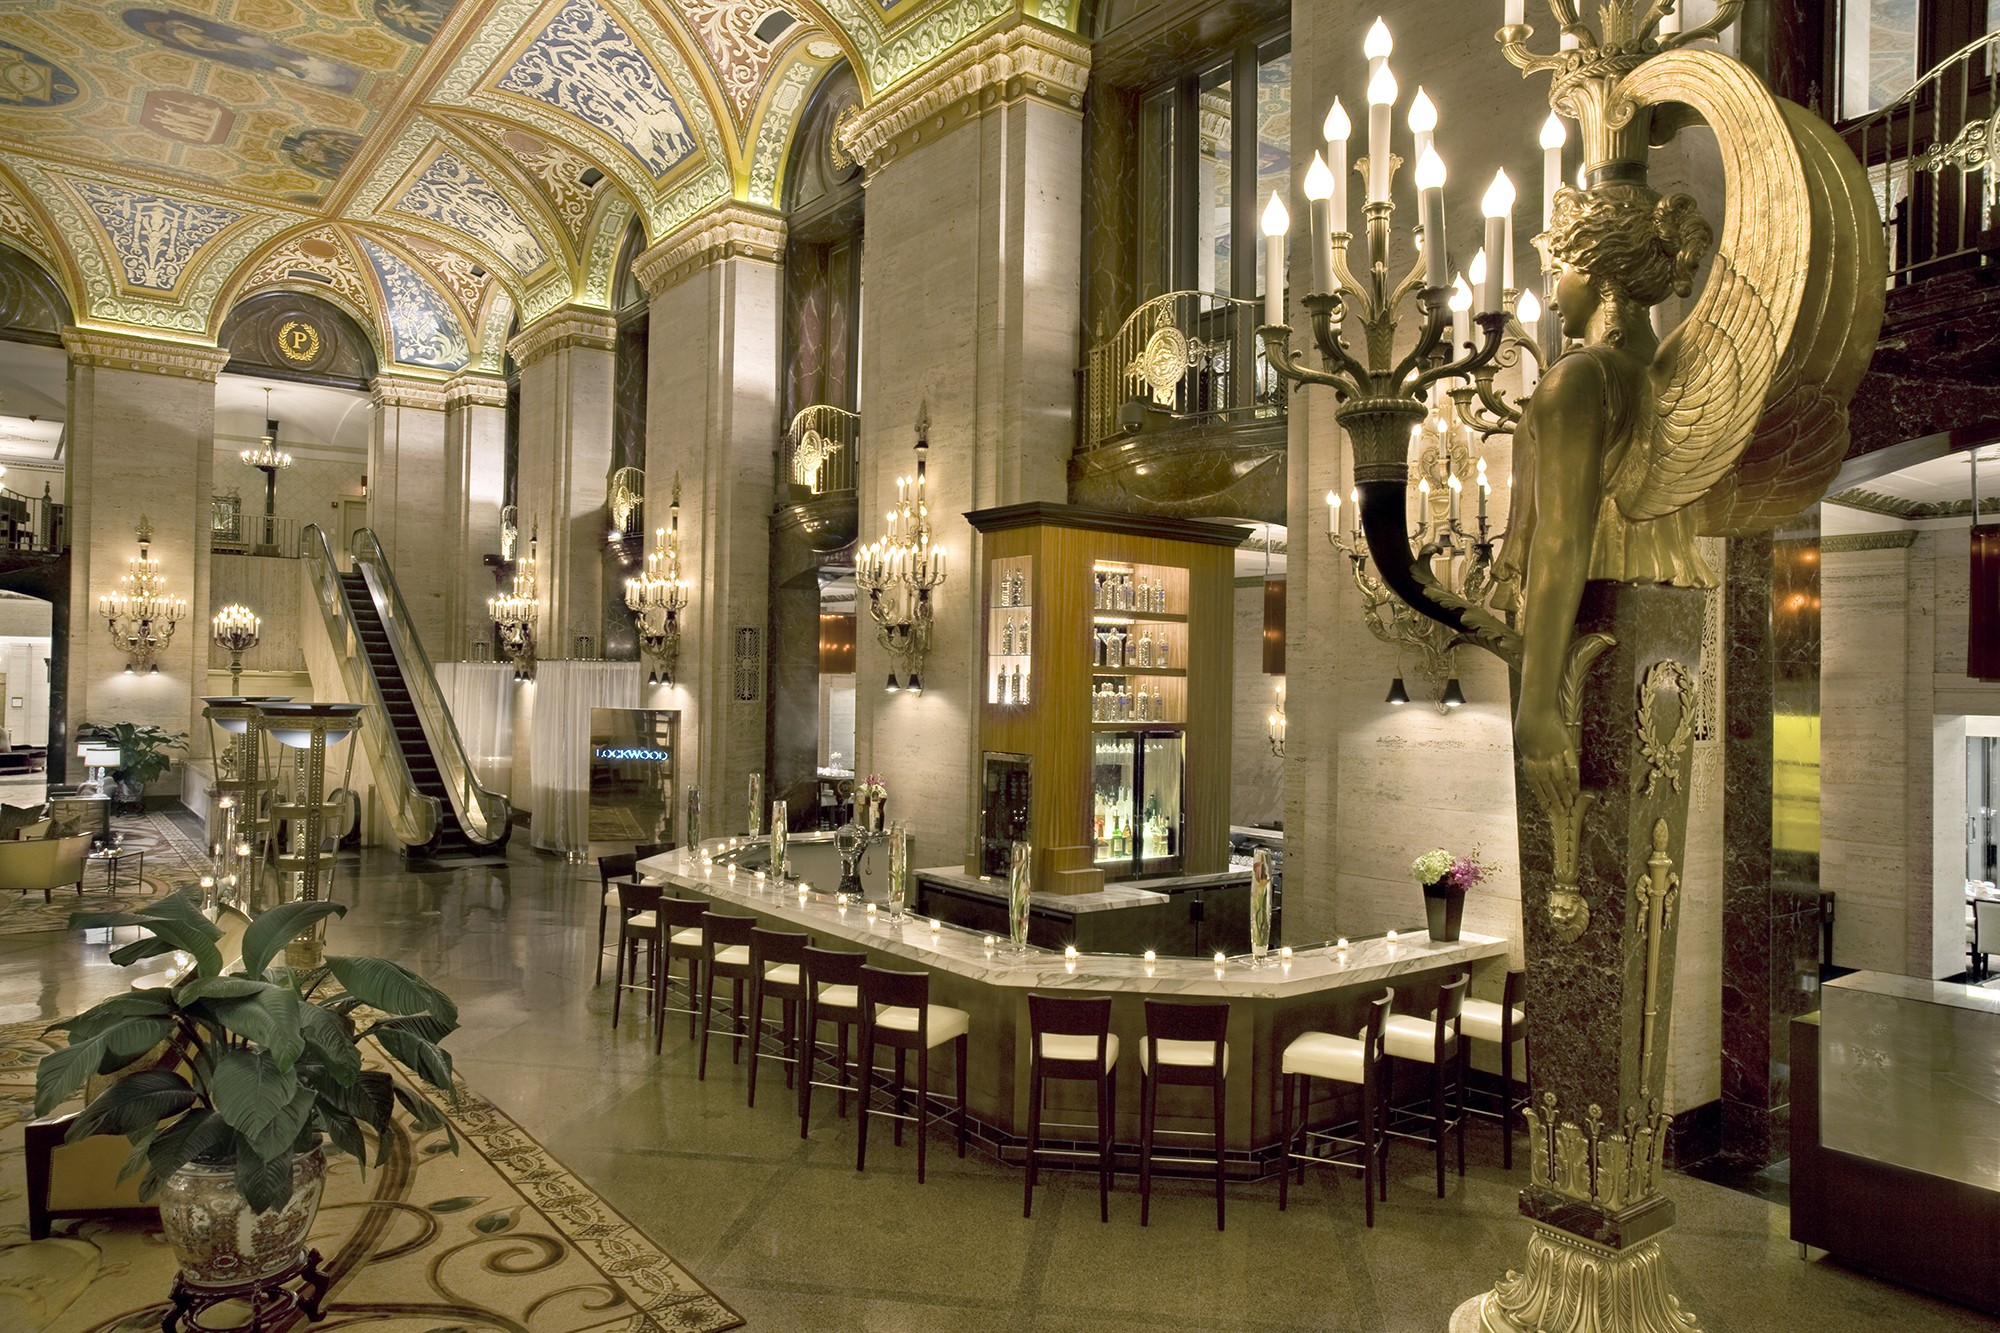 tour-palmer-house-hilton-hotel.jpg